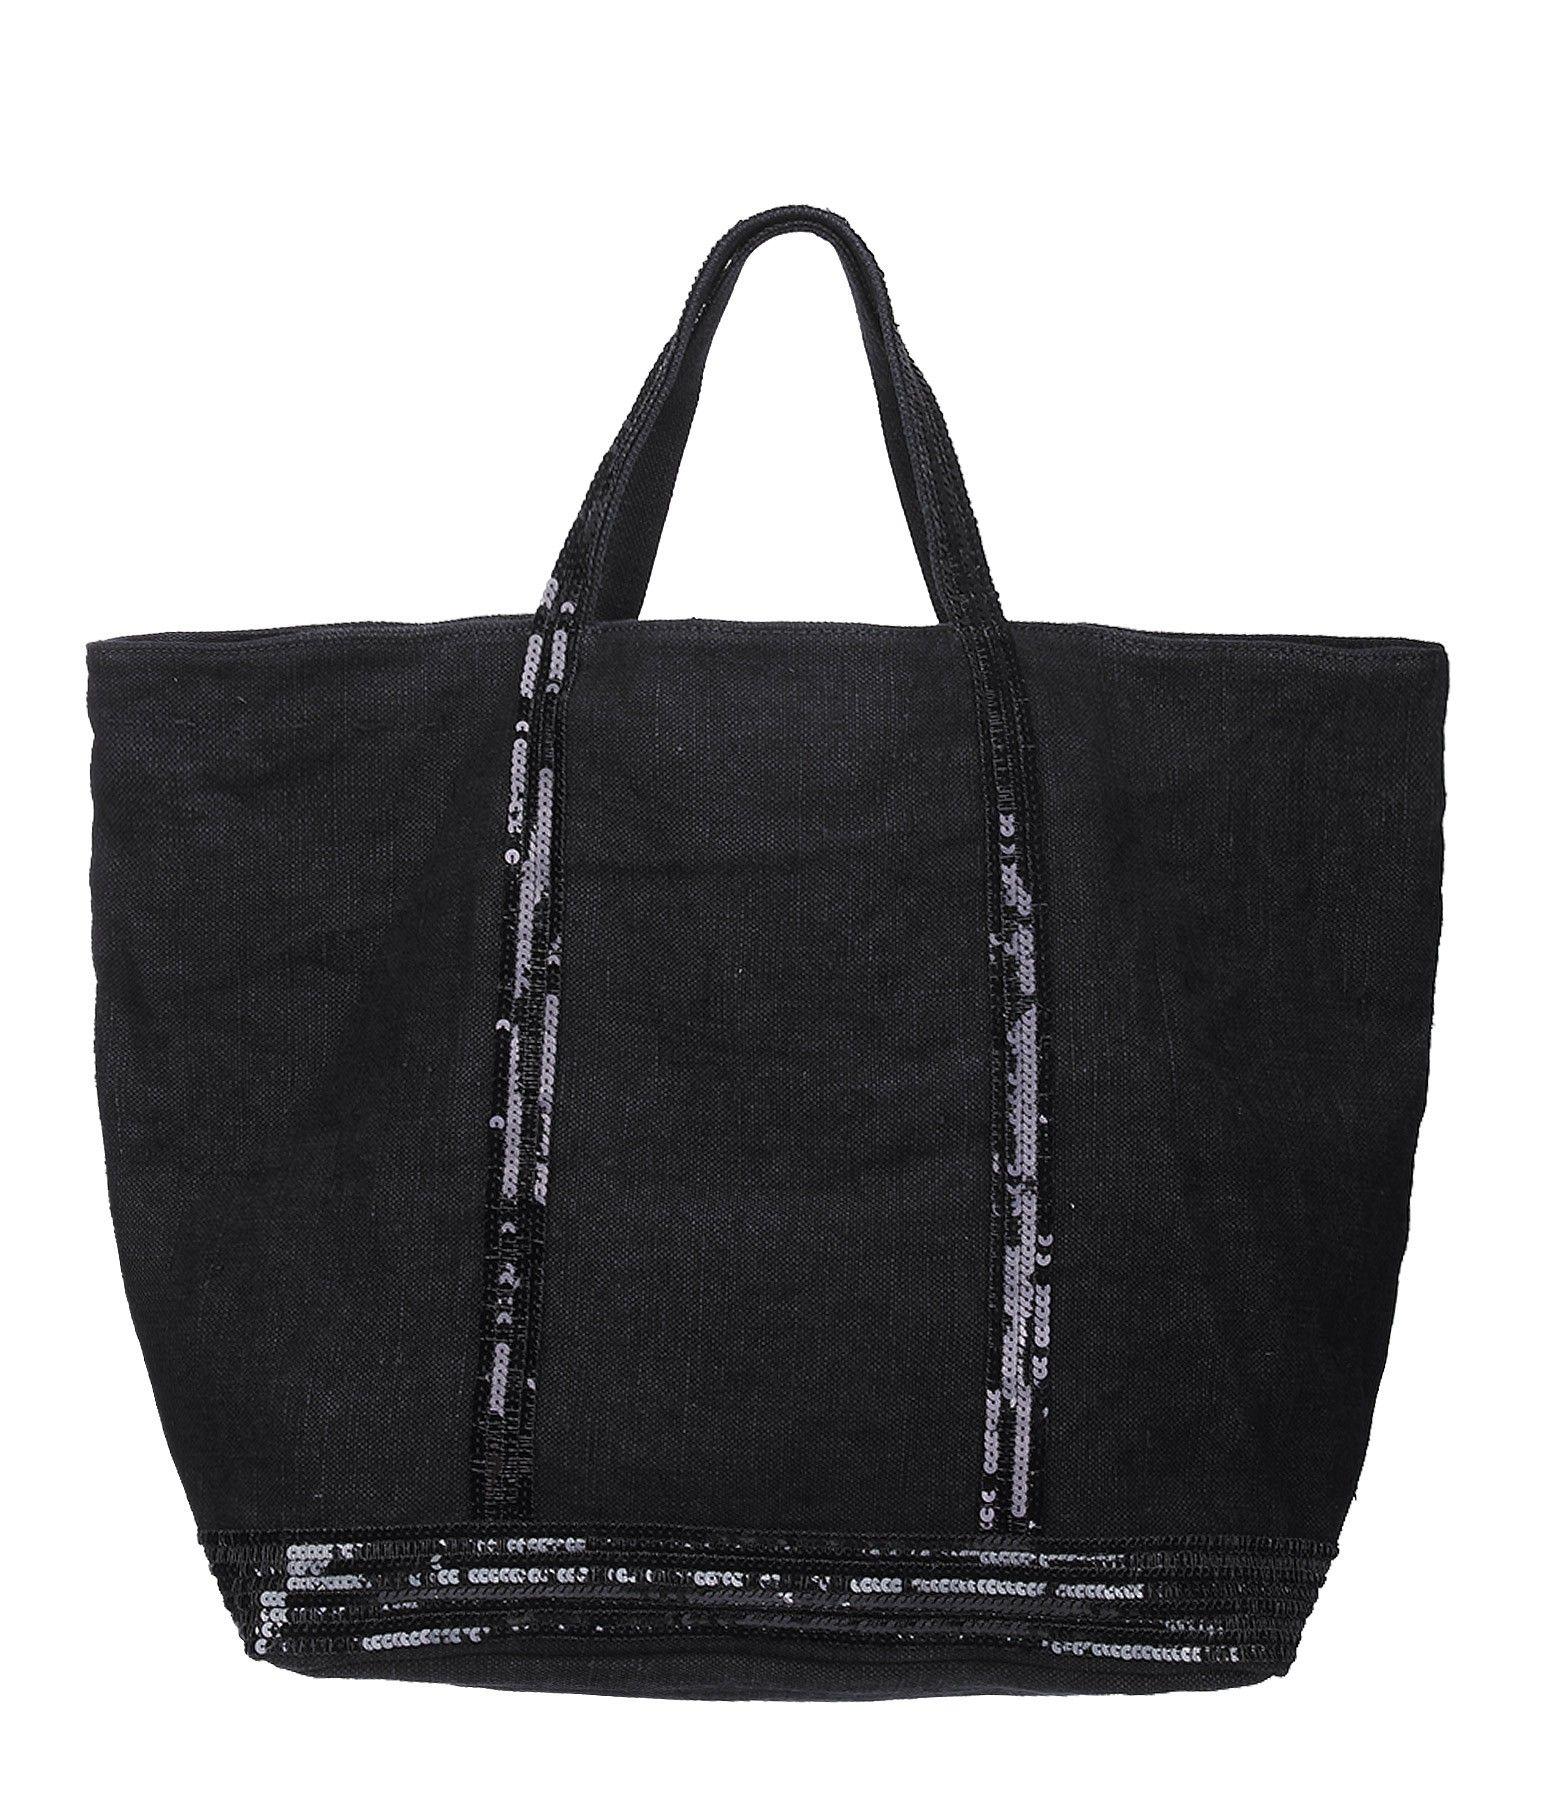 cabas grand lin noir vanessa bruno wanted pinterest lin noir toiles et nouvelle collection. Black Bedroom Furniture Sets. Home Design Ideas